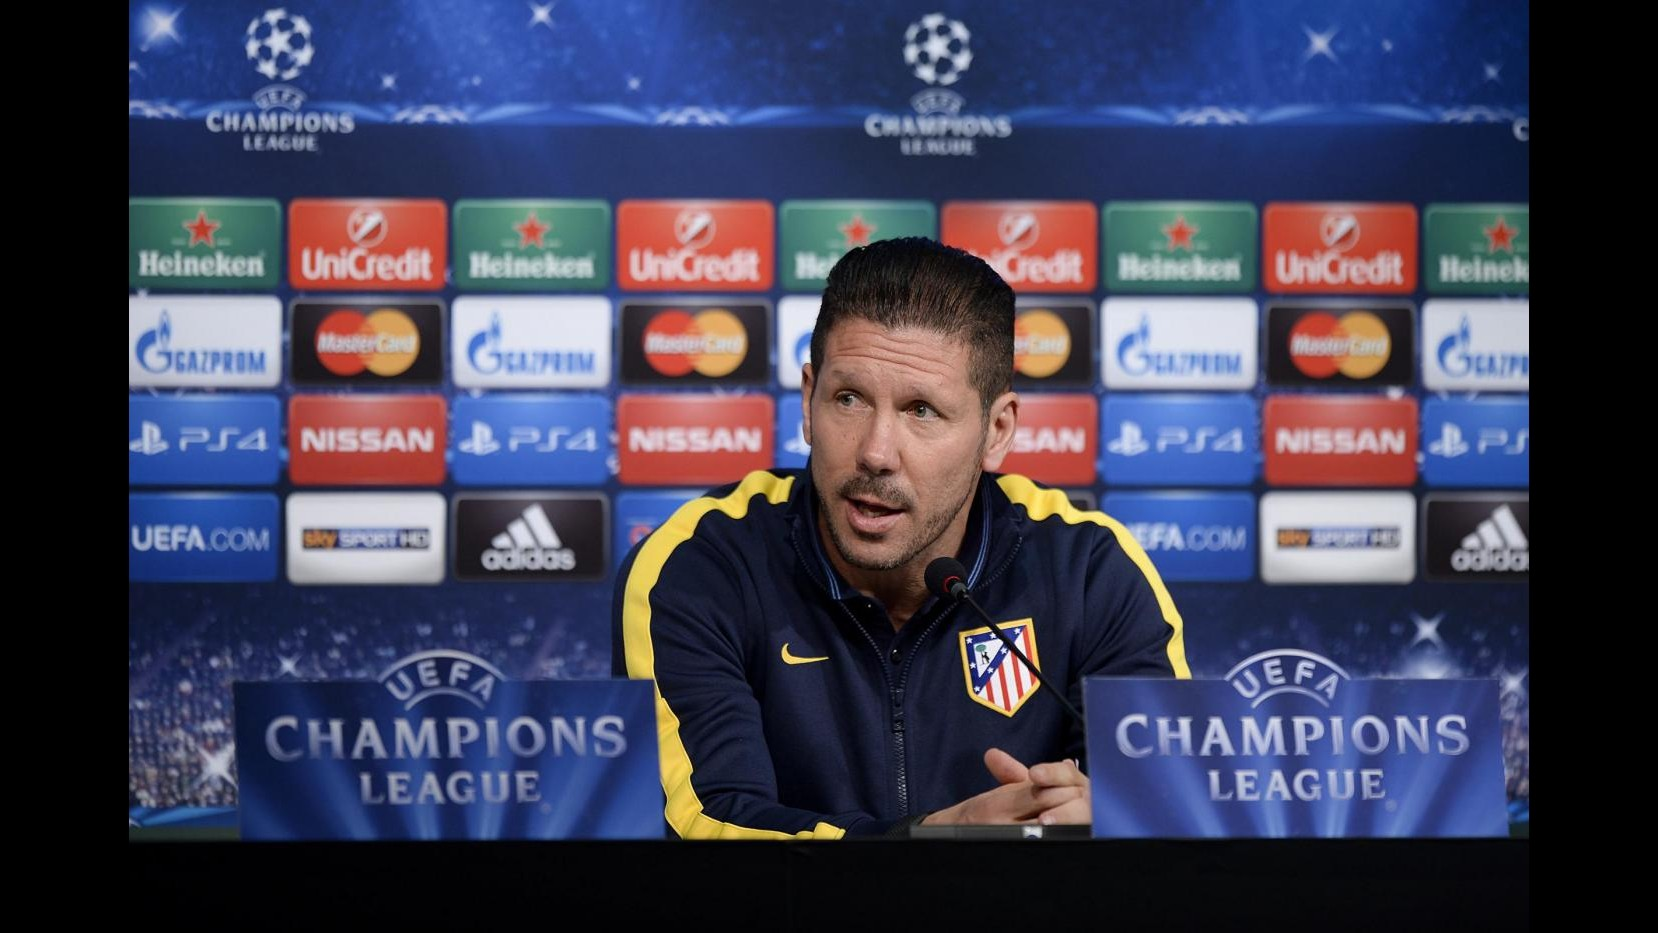 Chammpions League, Simeone: Con Juve ci sarà ci sarà atmosfera di una finale